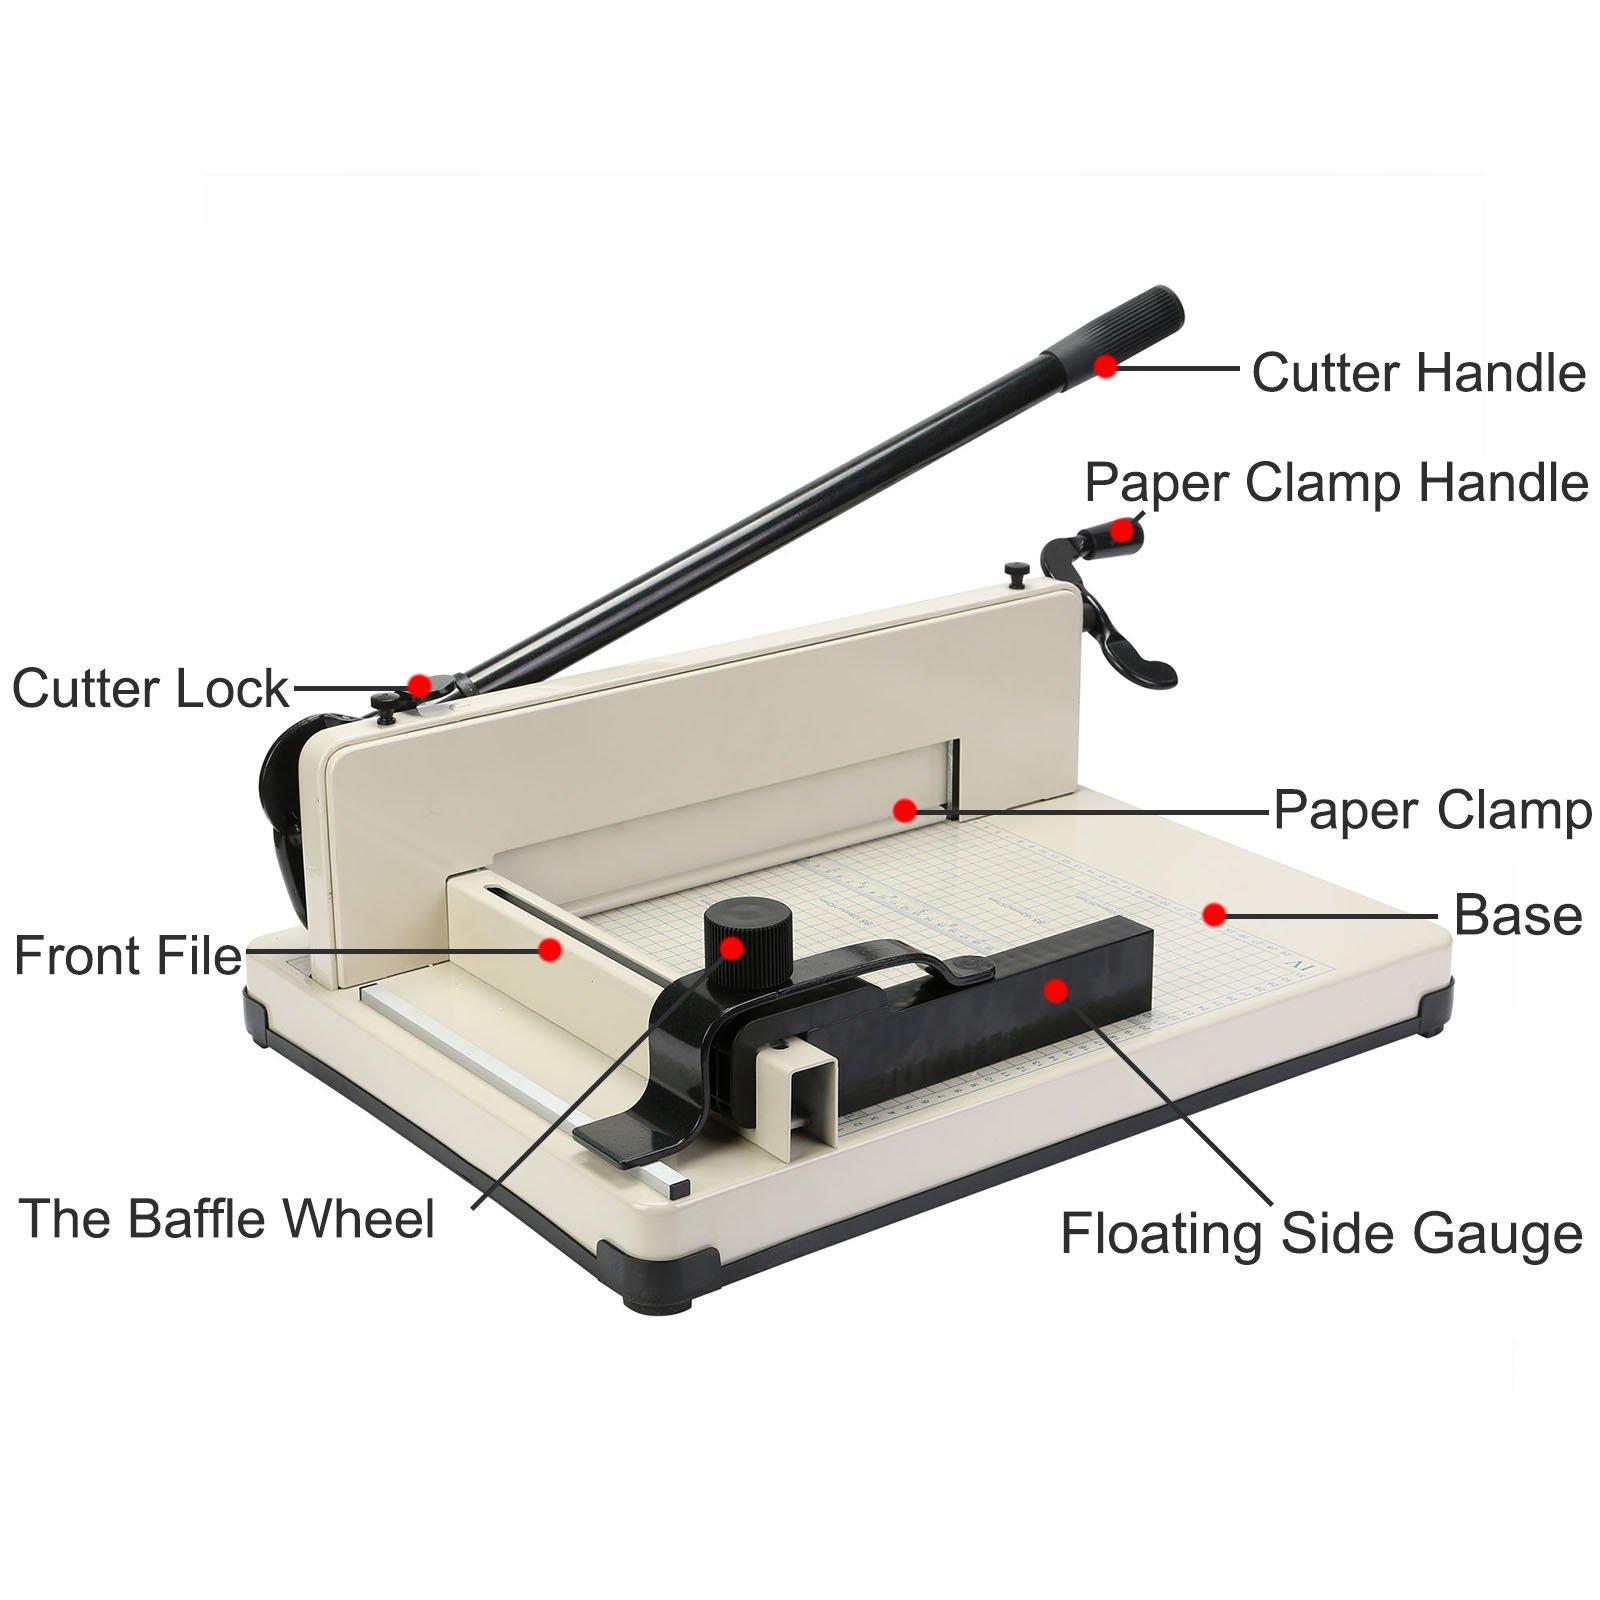 Superland 12 Inch A4 Paper Cutter Capacity 80g 400 Sheet Capacity Industrial Paper Cutter Commercial Metal-Base A3 Trimmer (858-A4 Manual)